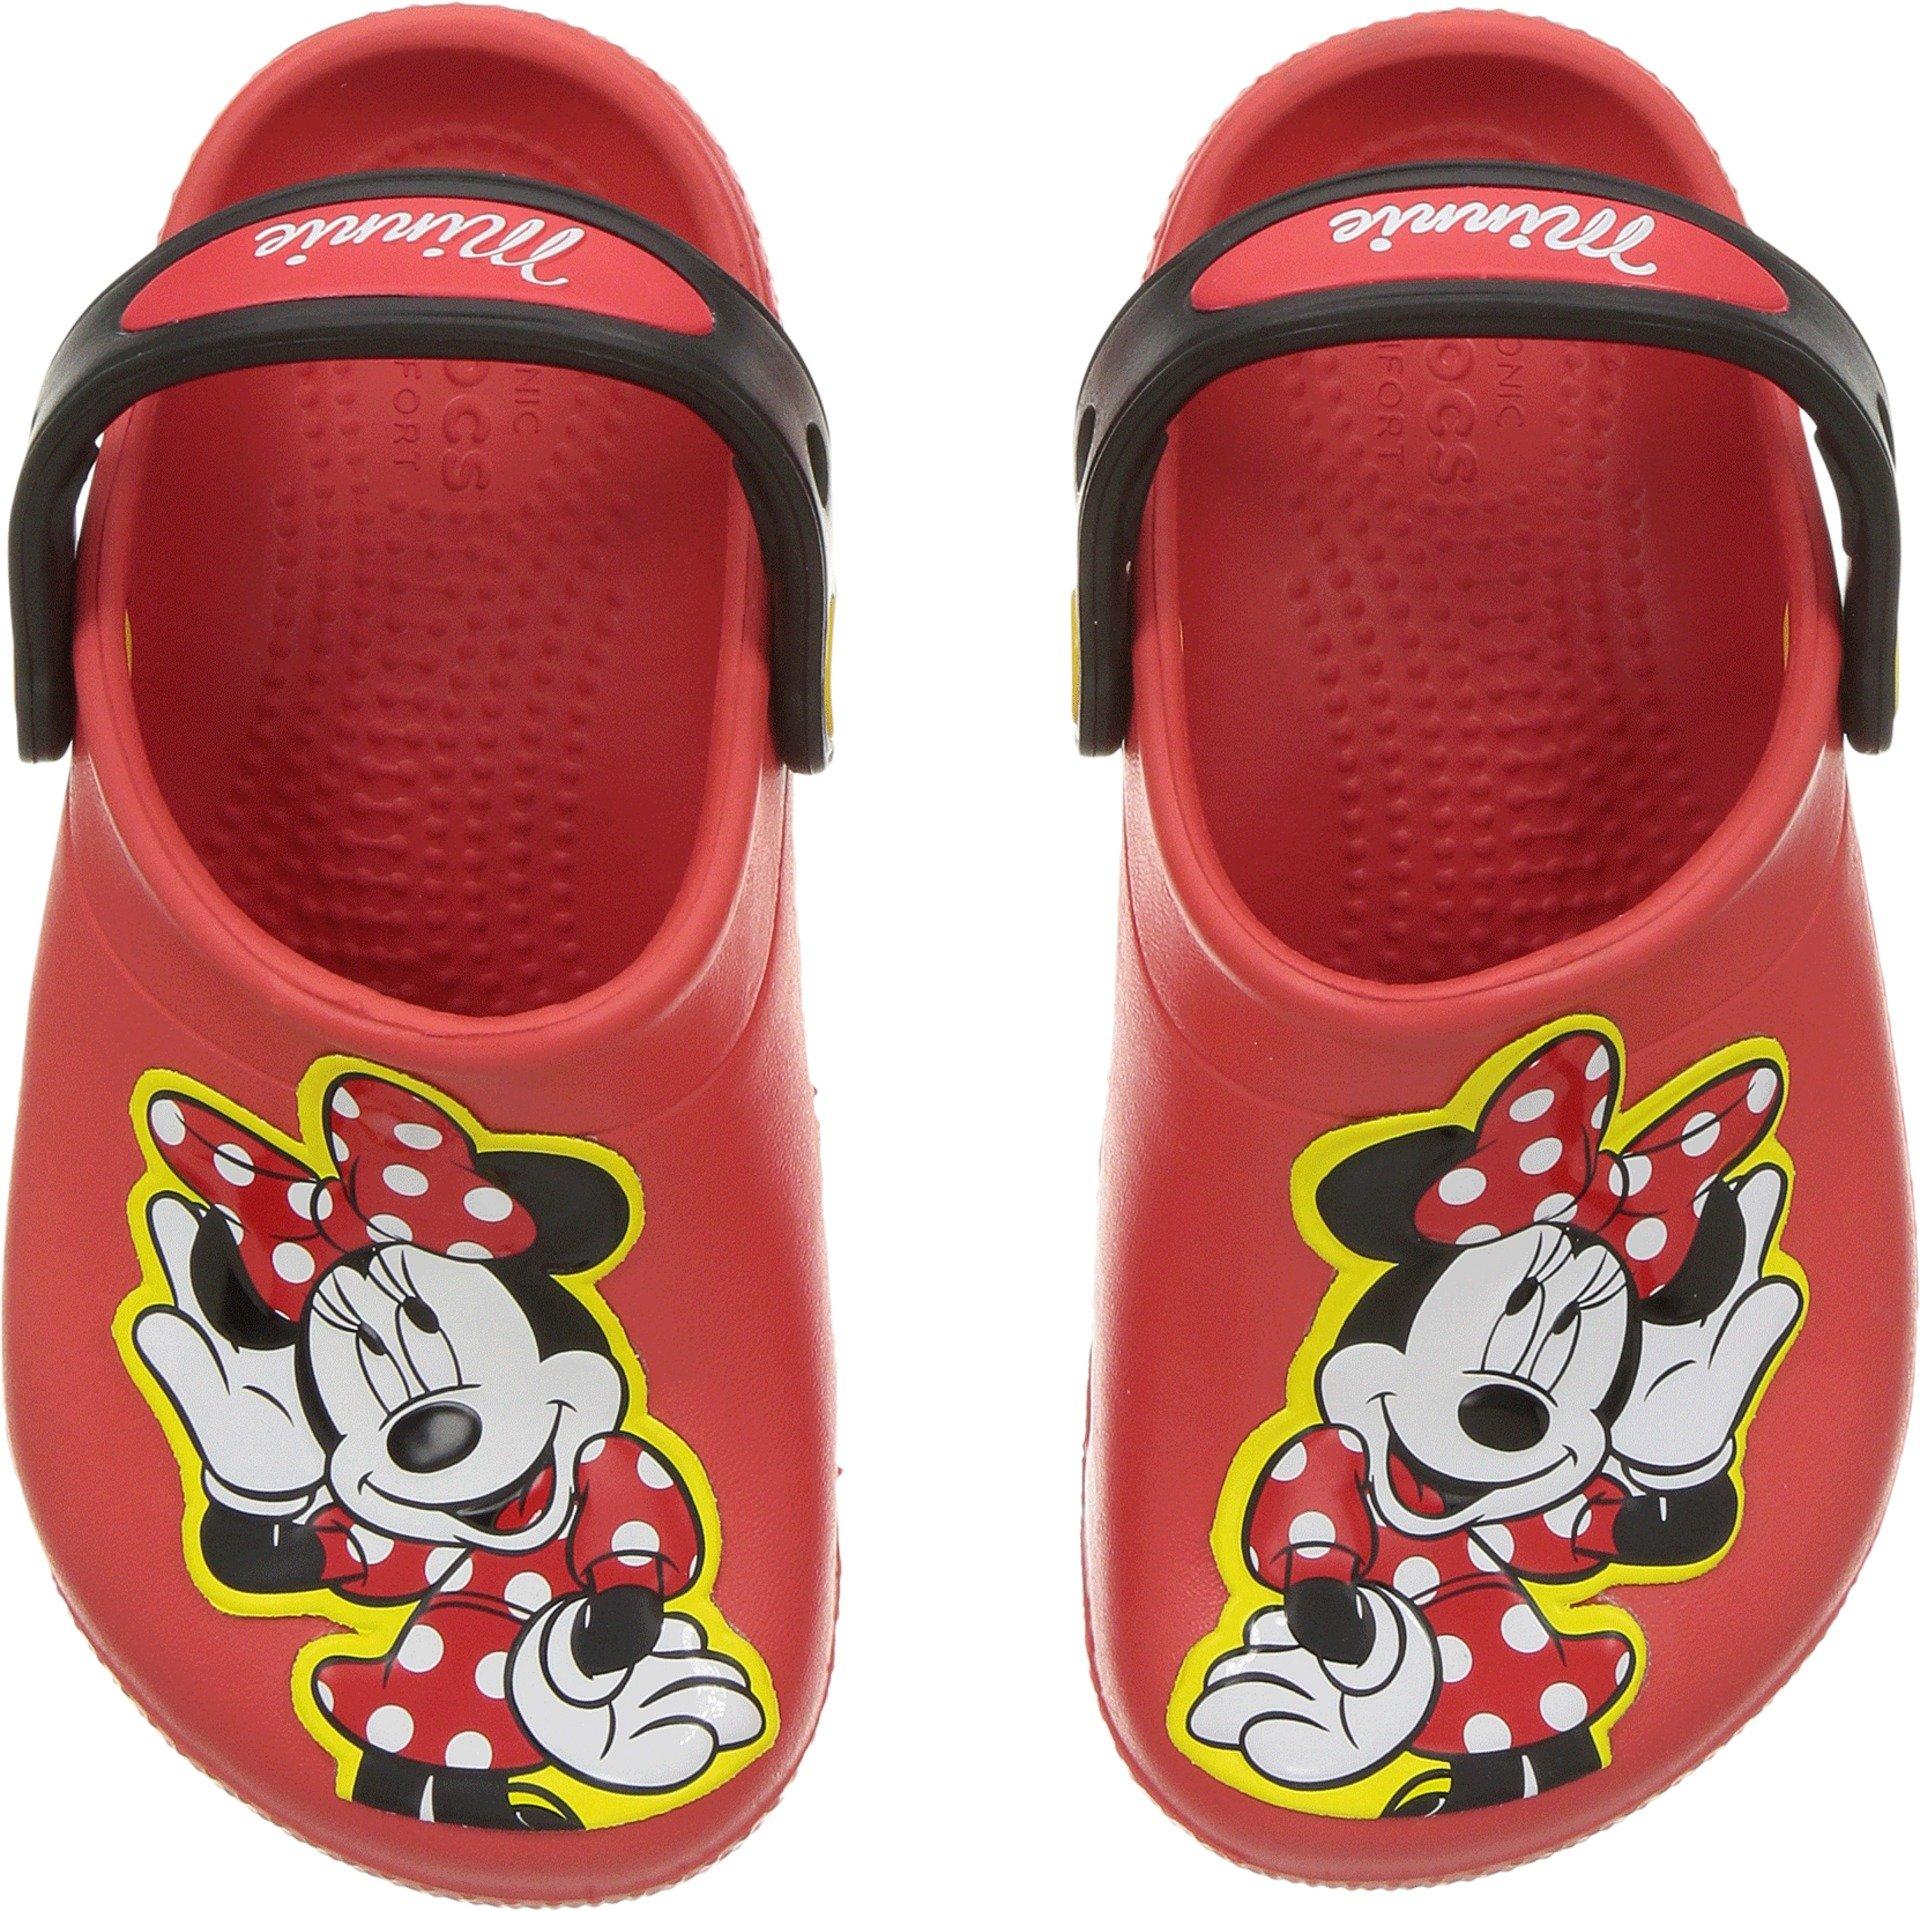 Crocs Girls' Fun Lab Minnie Clog, Flame, 8 M US Toddler by Crocs (Image #1)